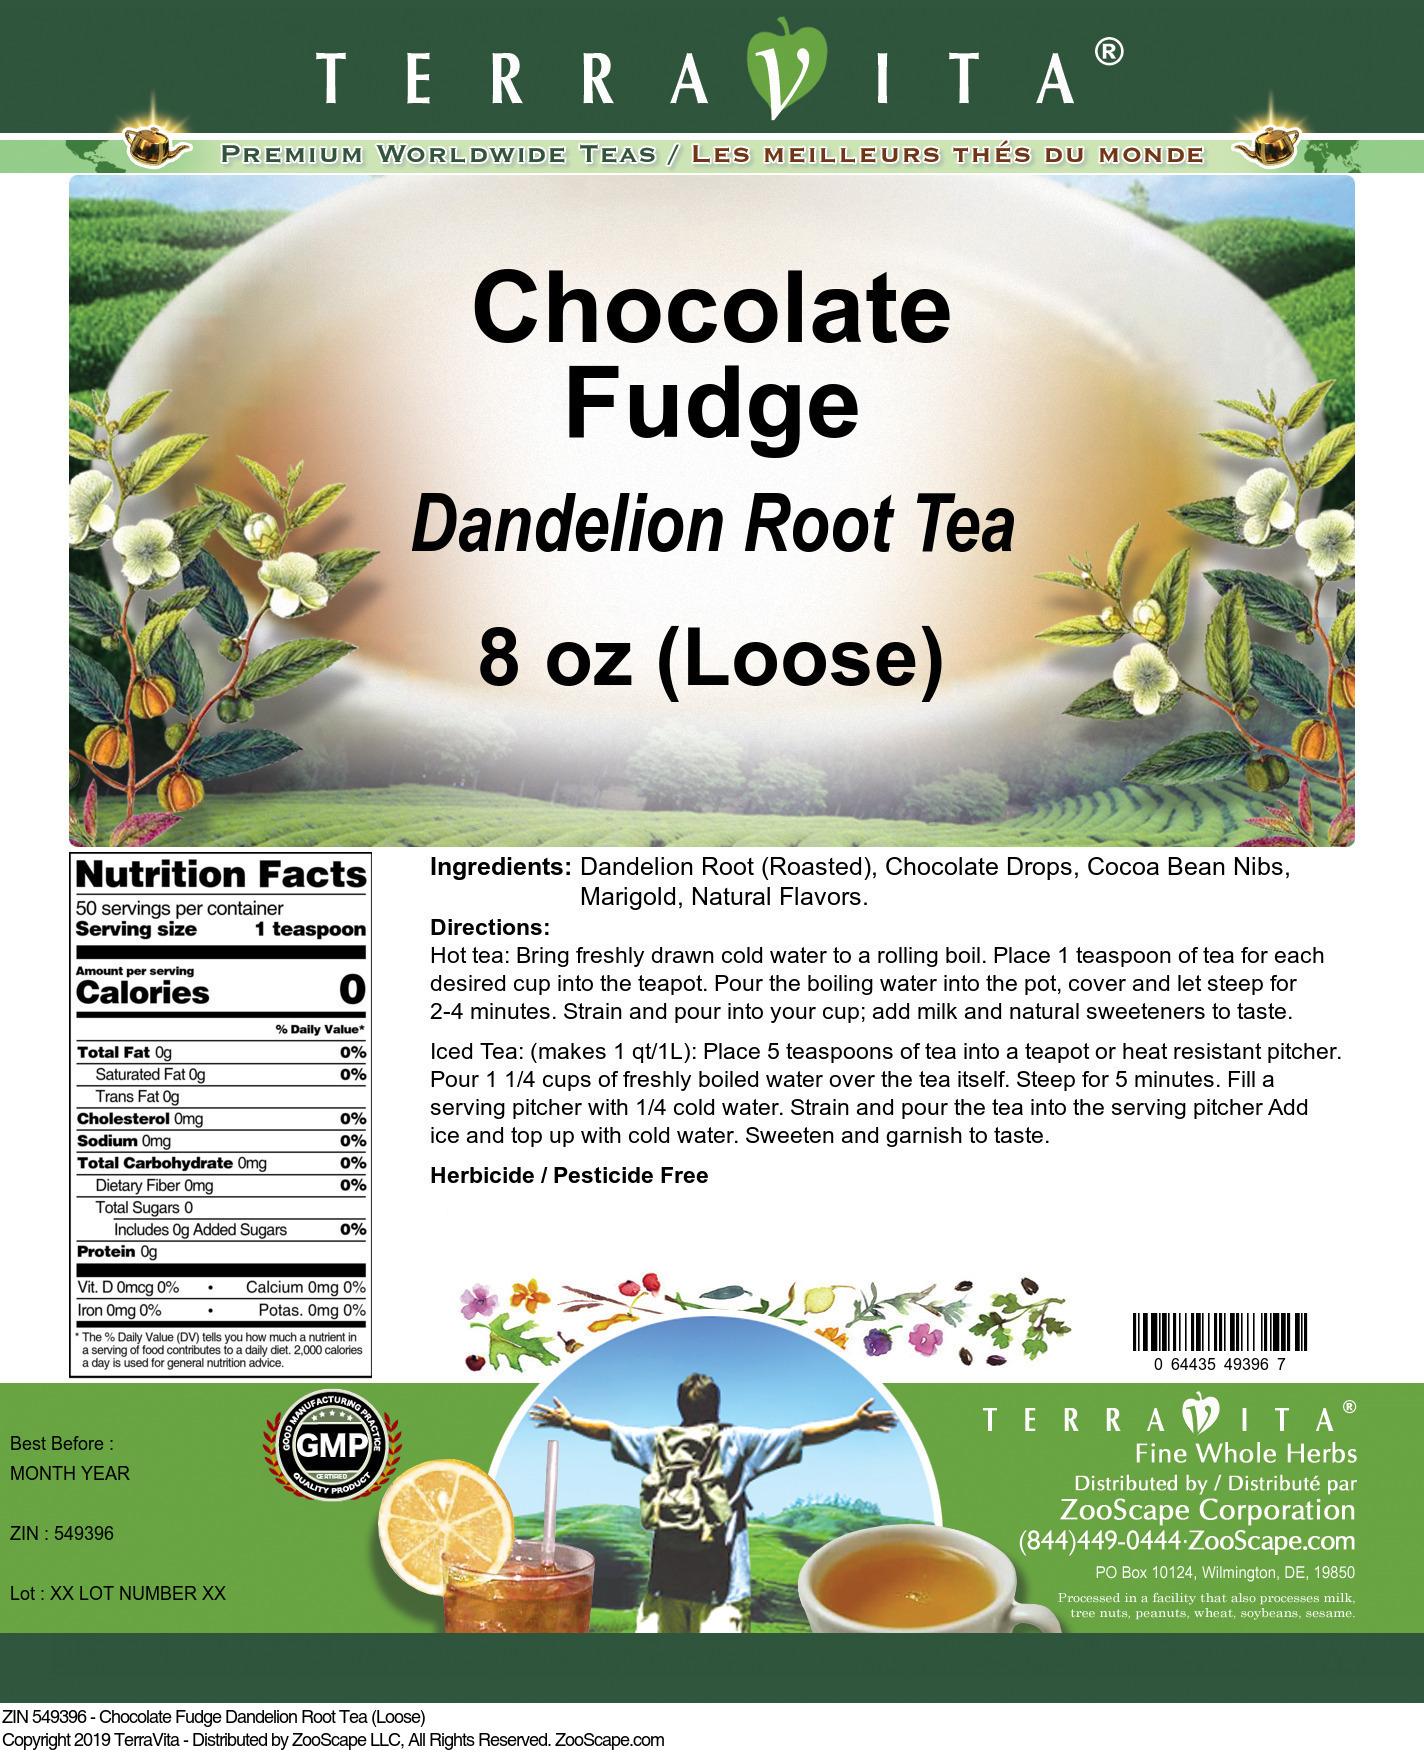 Chocolate Fudge Dandelion Root